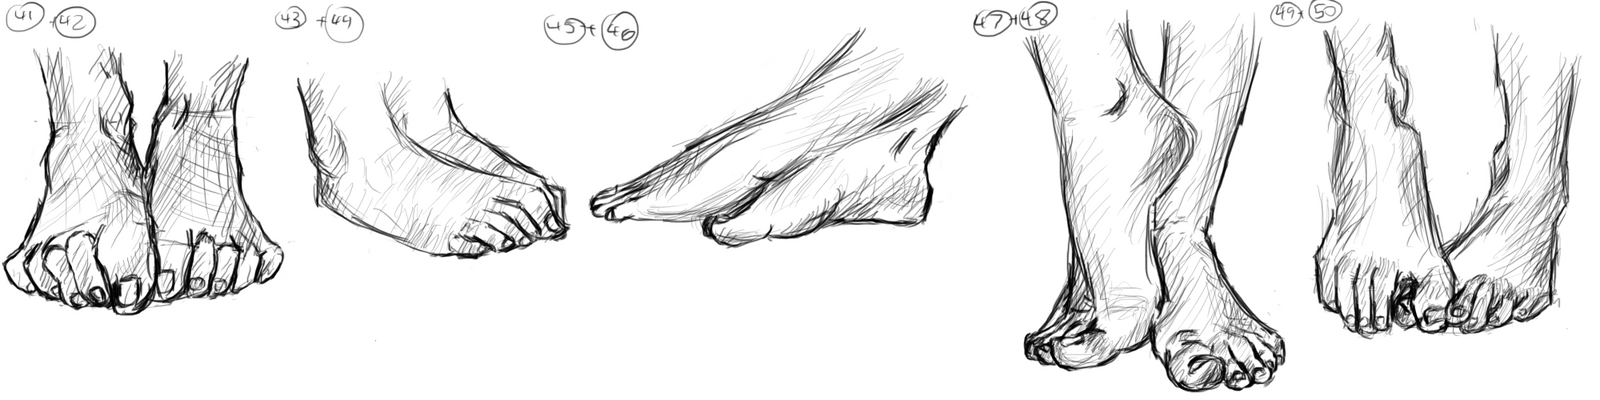 Feet (41-50)! by muslacrima